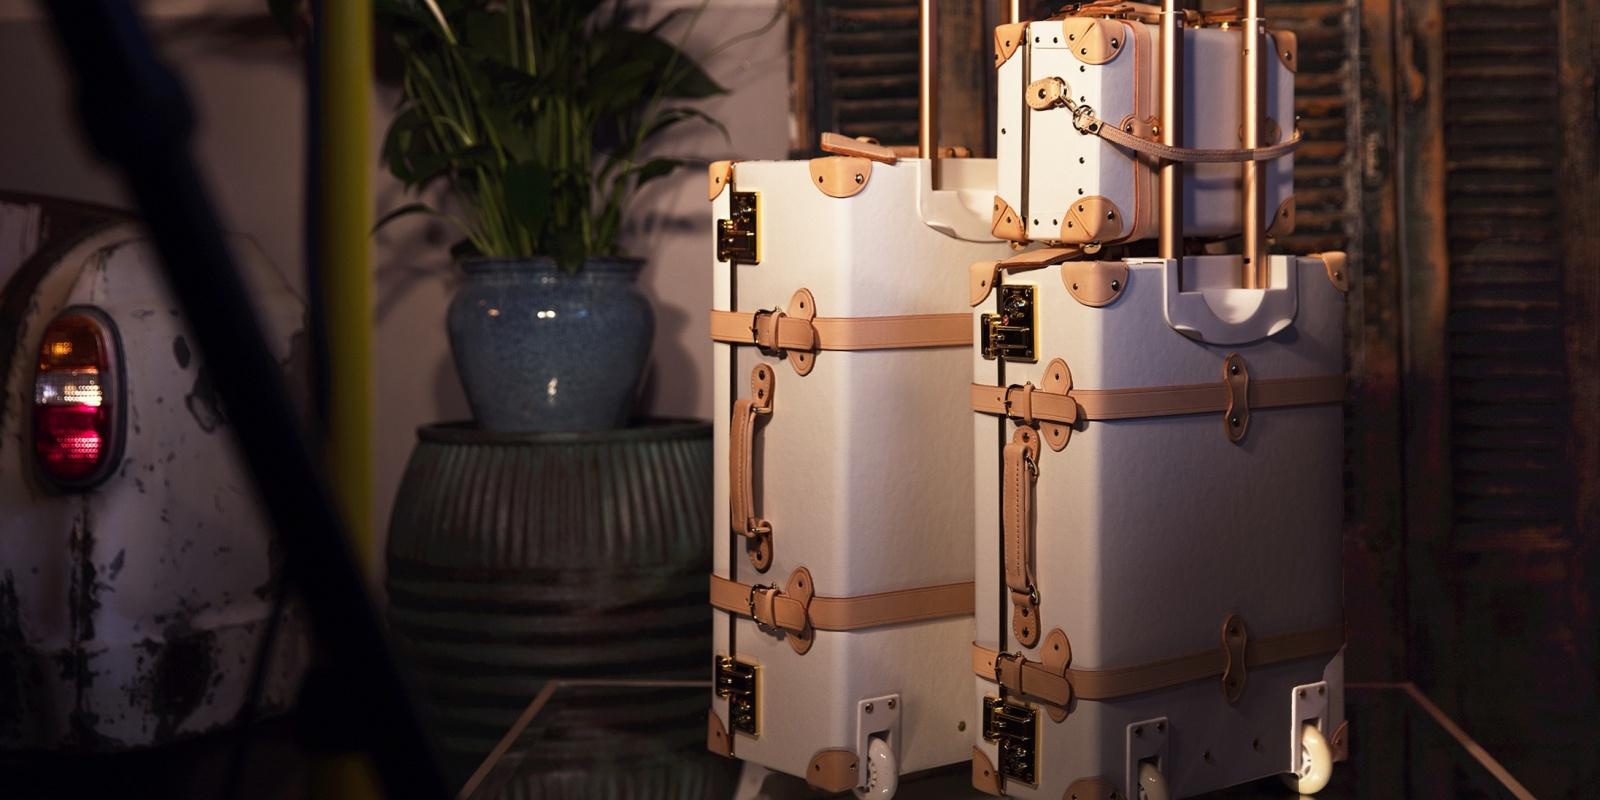 Photos: SteamLine Luggage